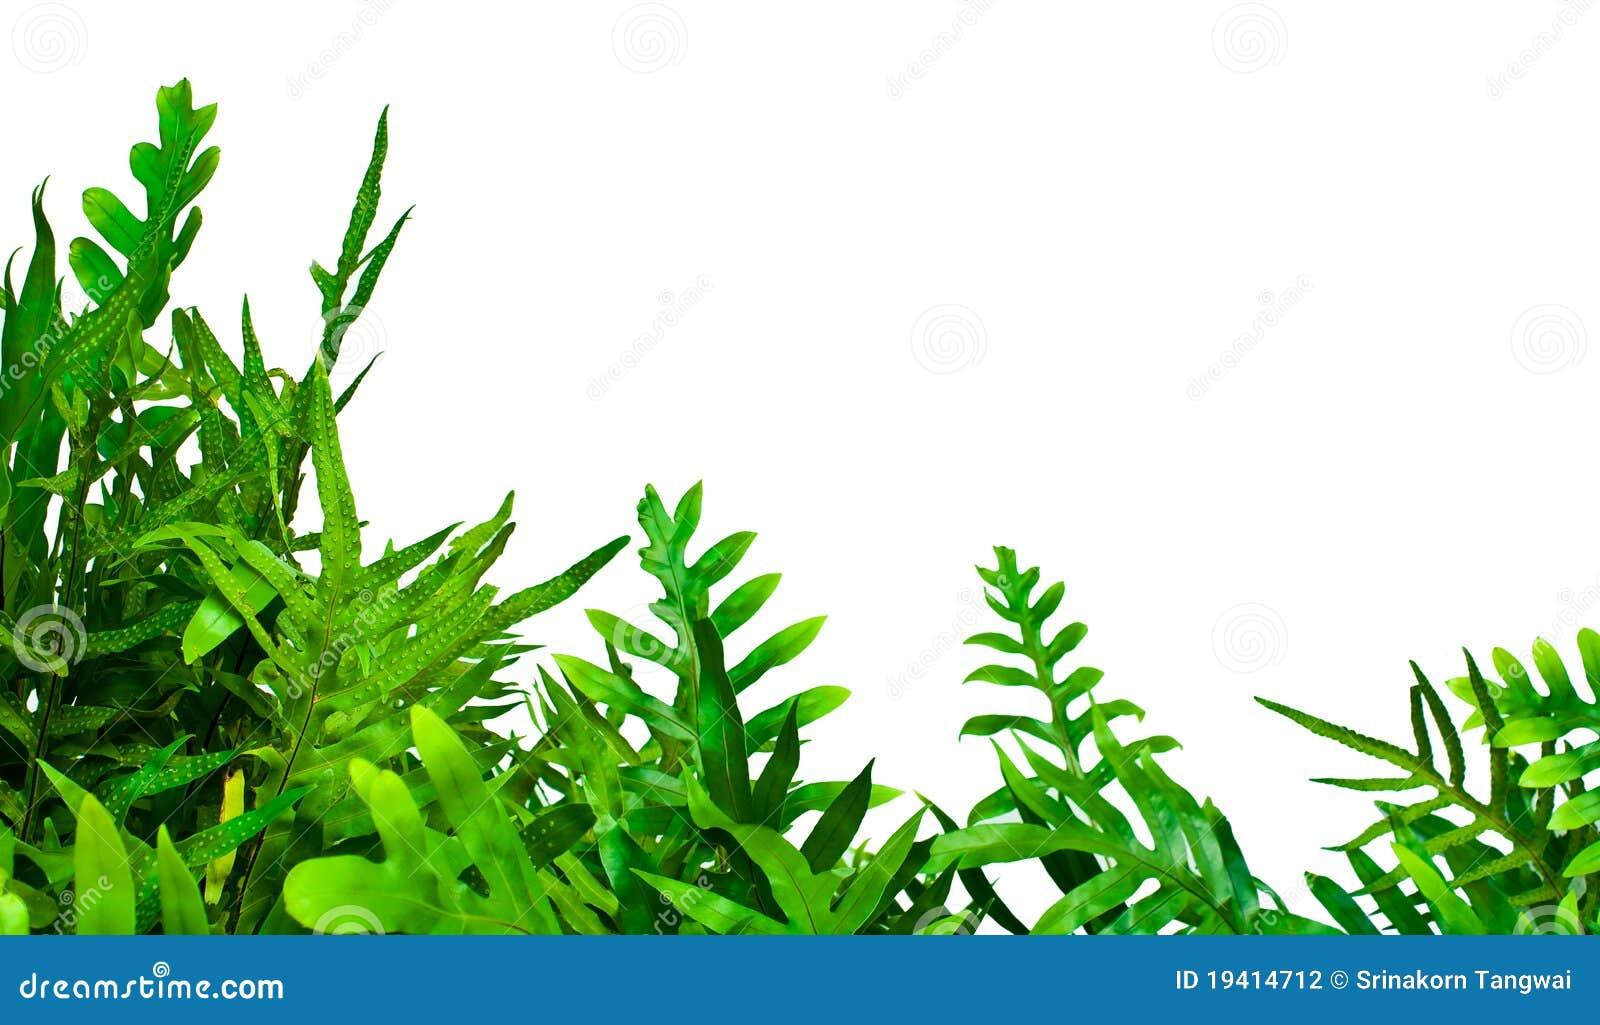 fern isolated on white background stock photography